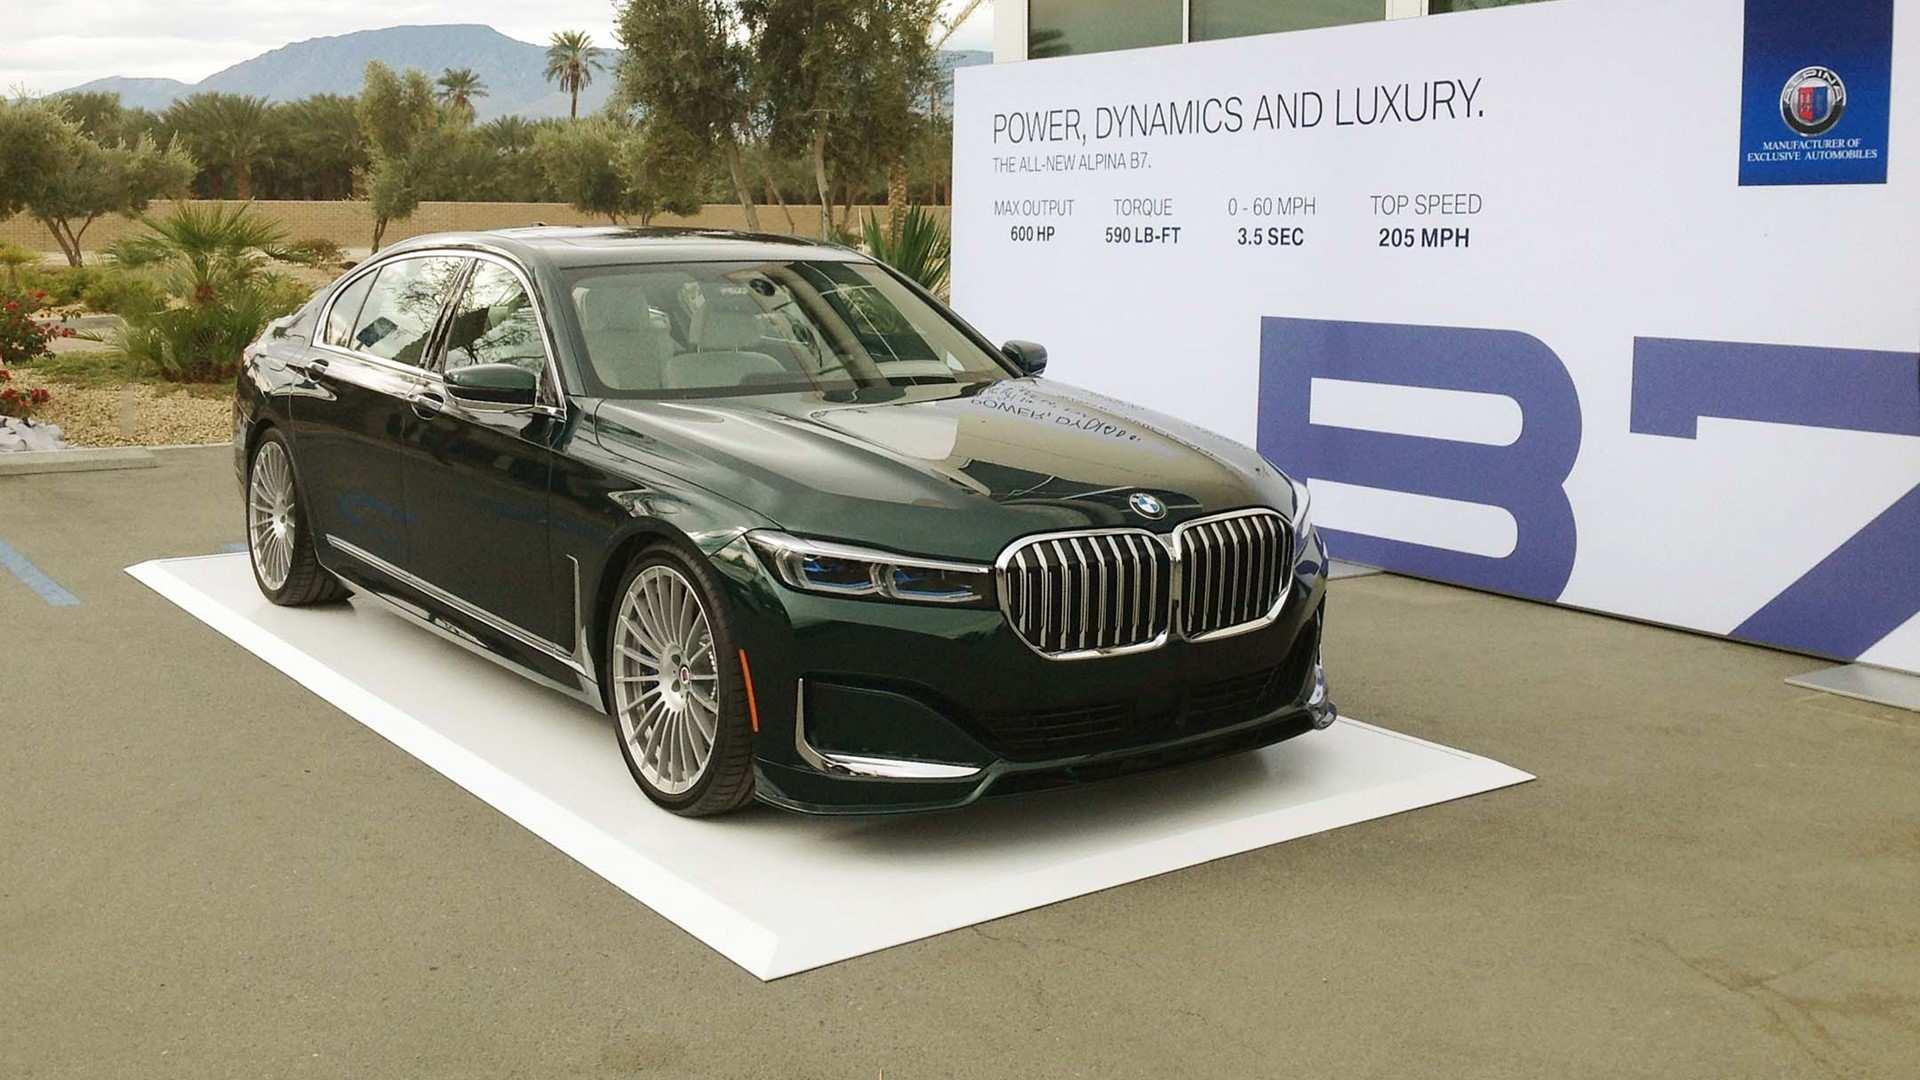 80 Great BMW Alpina B7 2020 Price Price with BMW Alpina B7 2020 Price